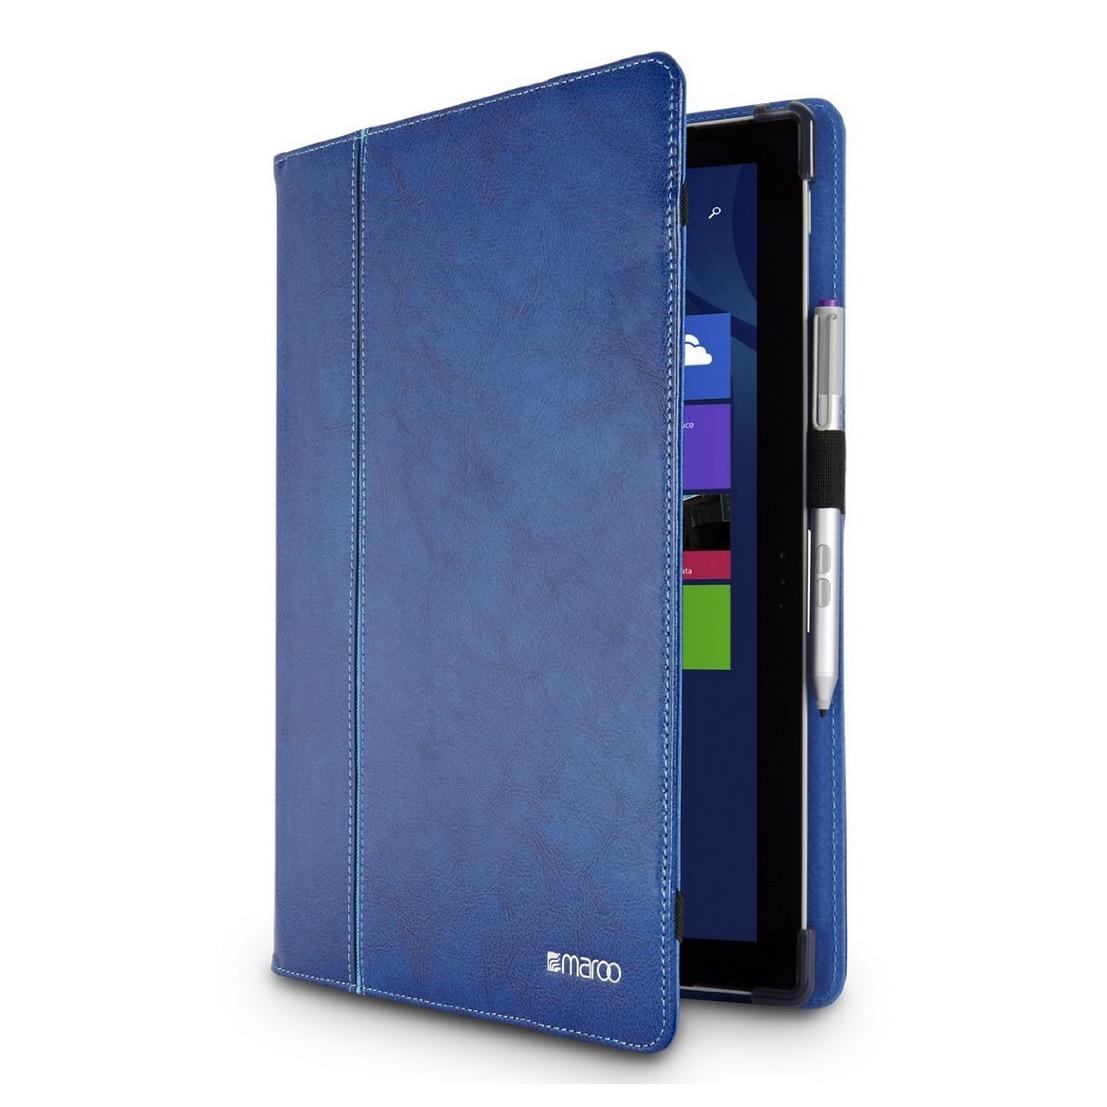 Folio etui surface pro 4 executive cuir v ritable bleu for Housse surface pro 4